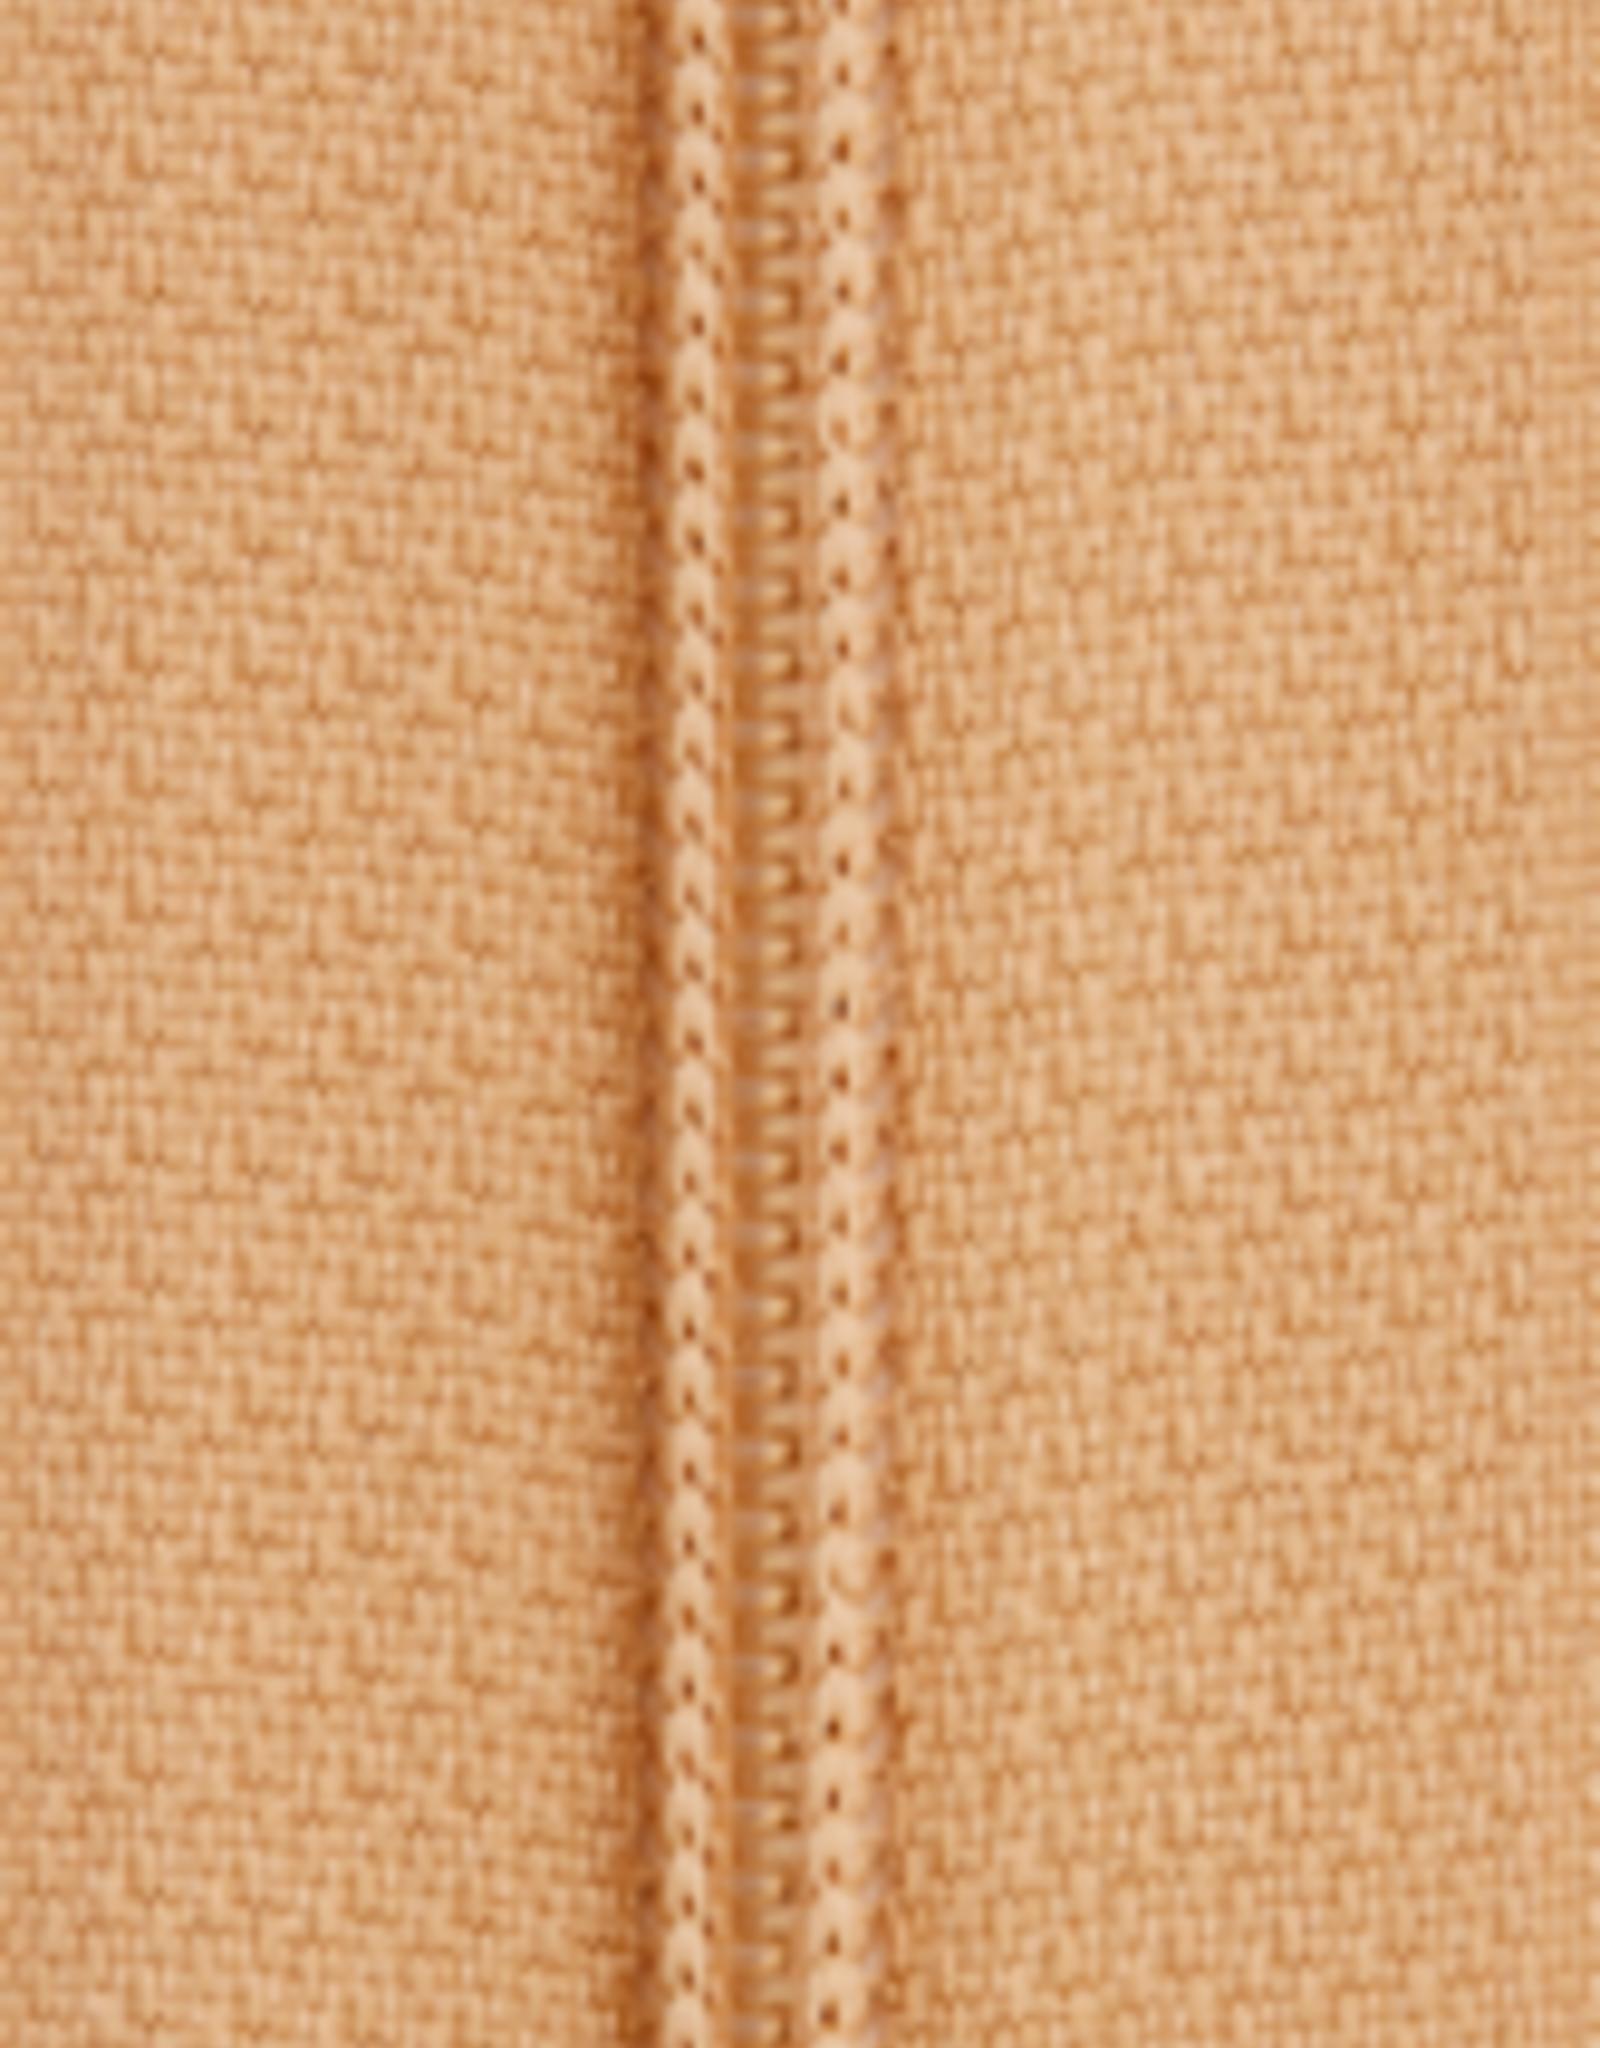 Union Knopf Endlosreißverschluss 3 mm